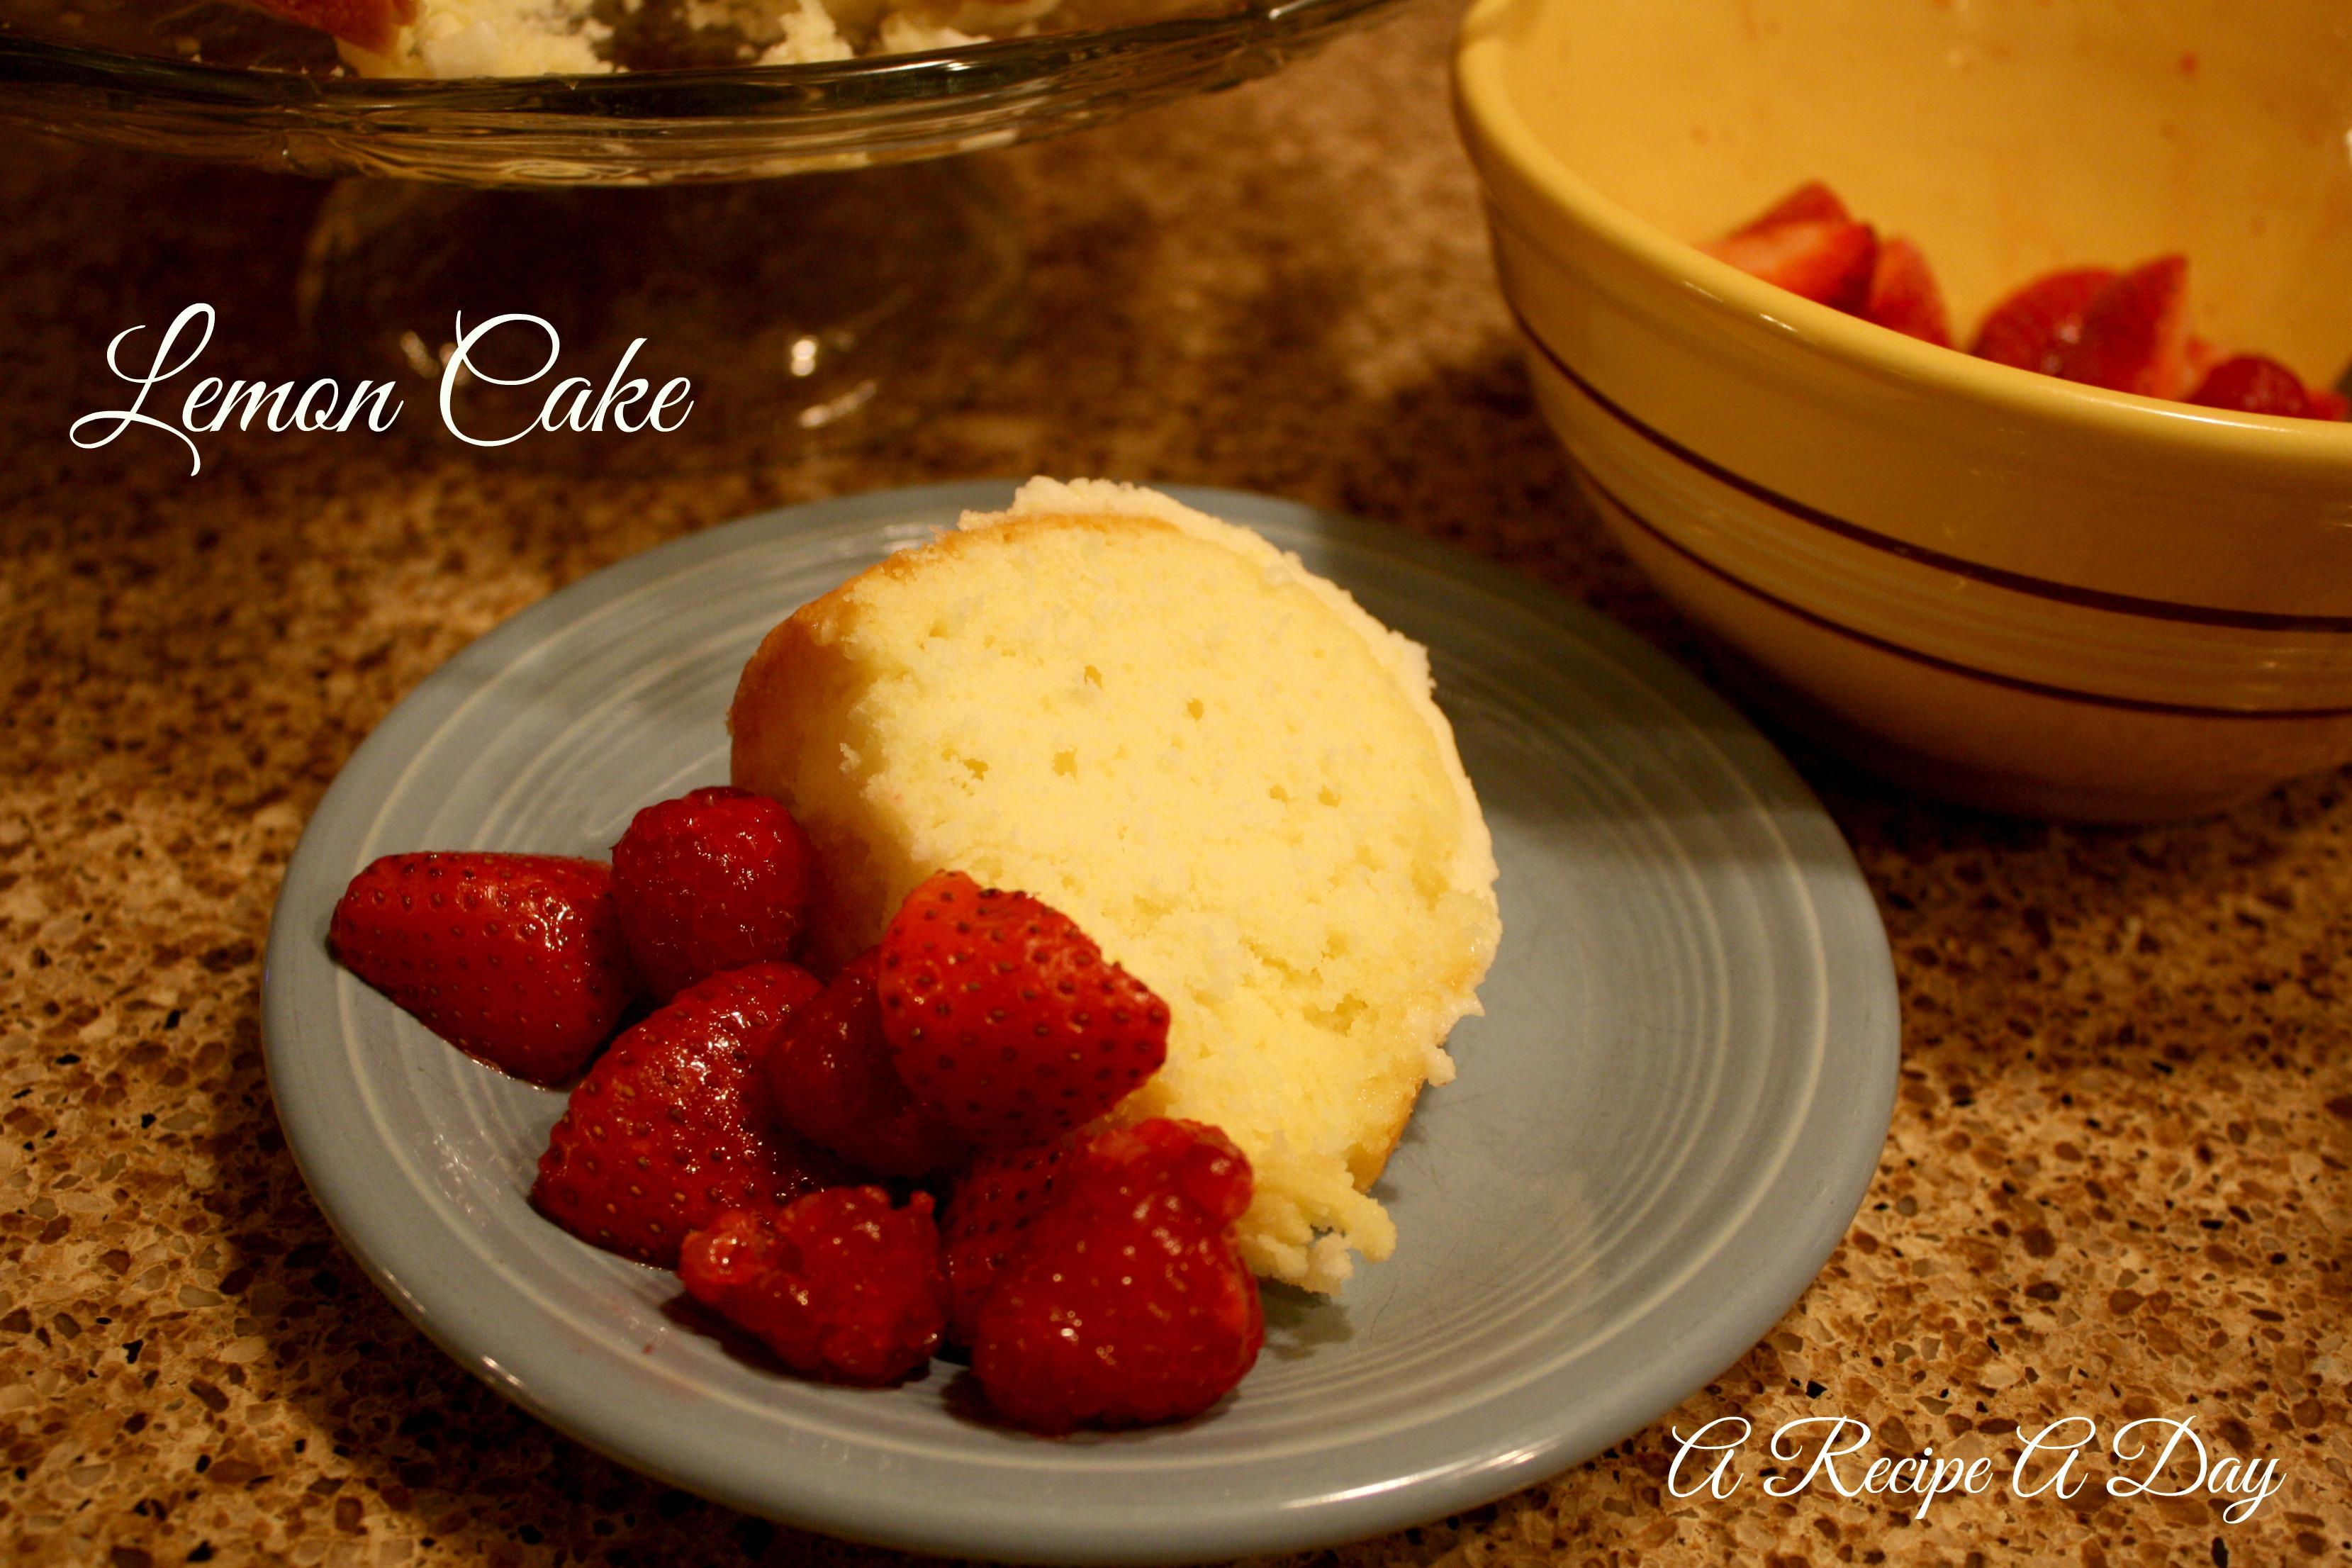 Cake Recipes Using Lemon Extract: A Recipe A Day